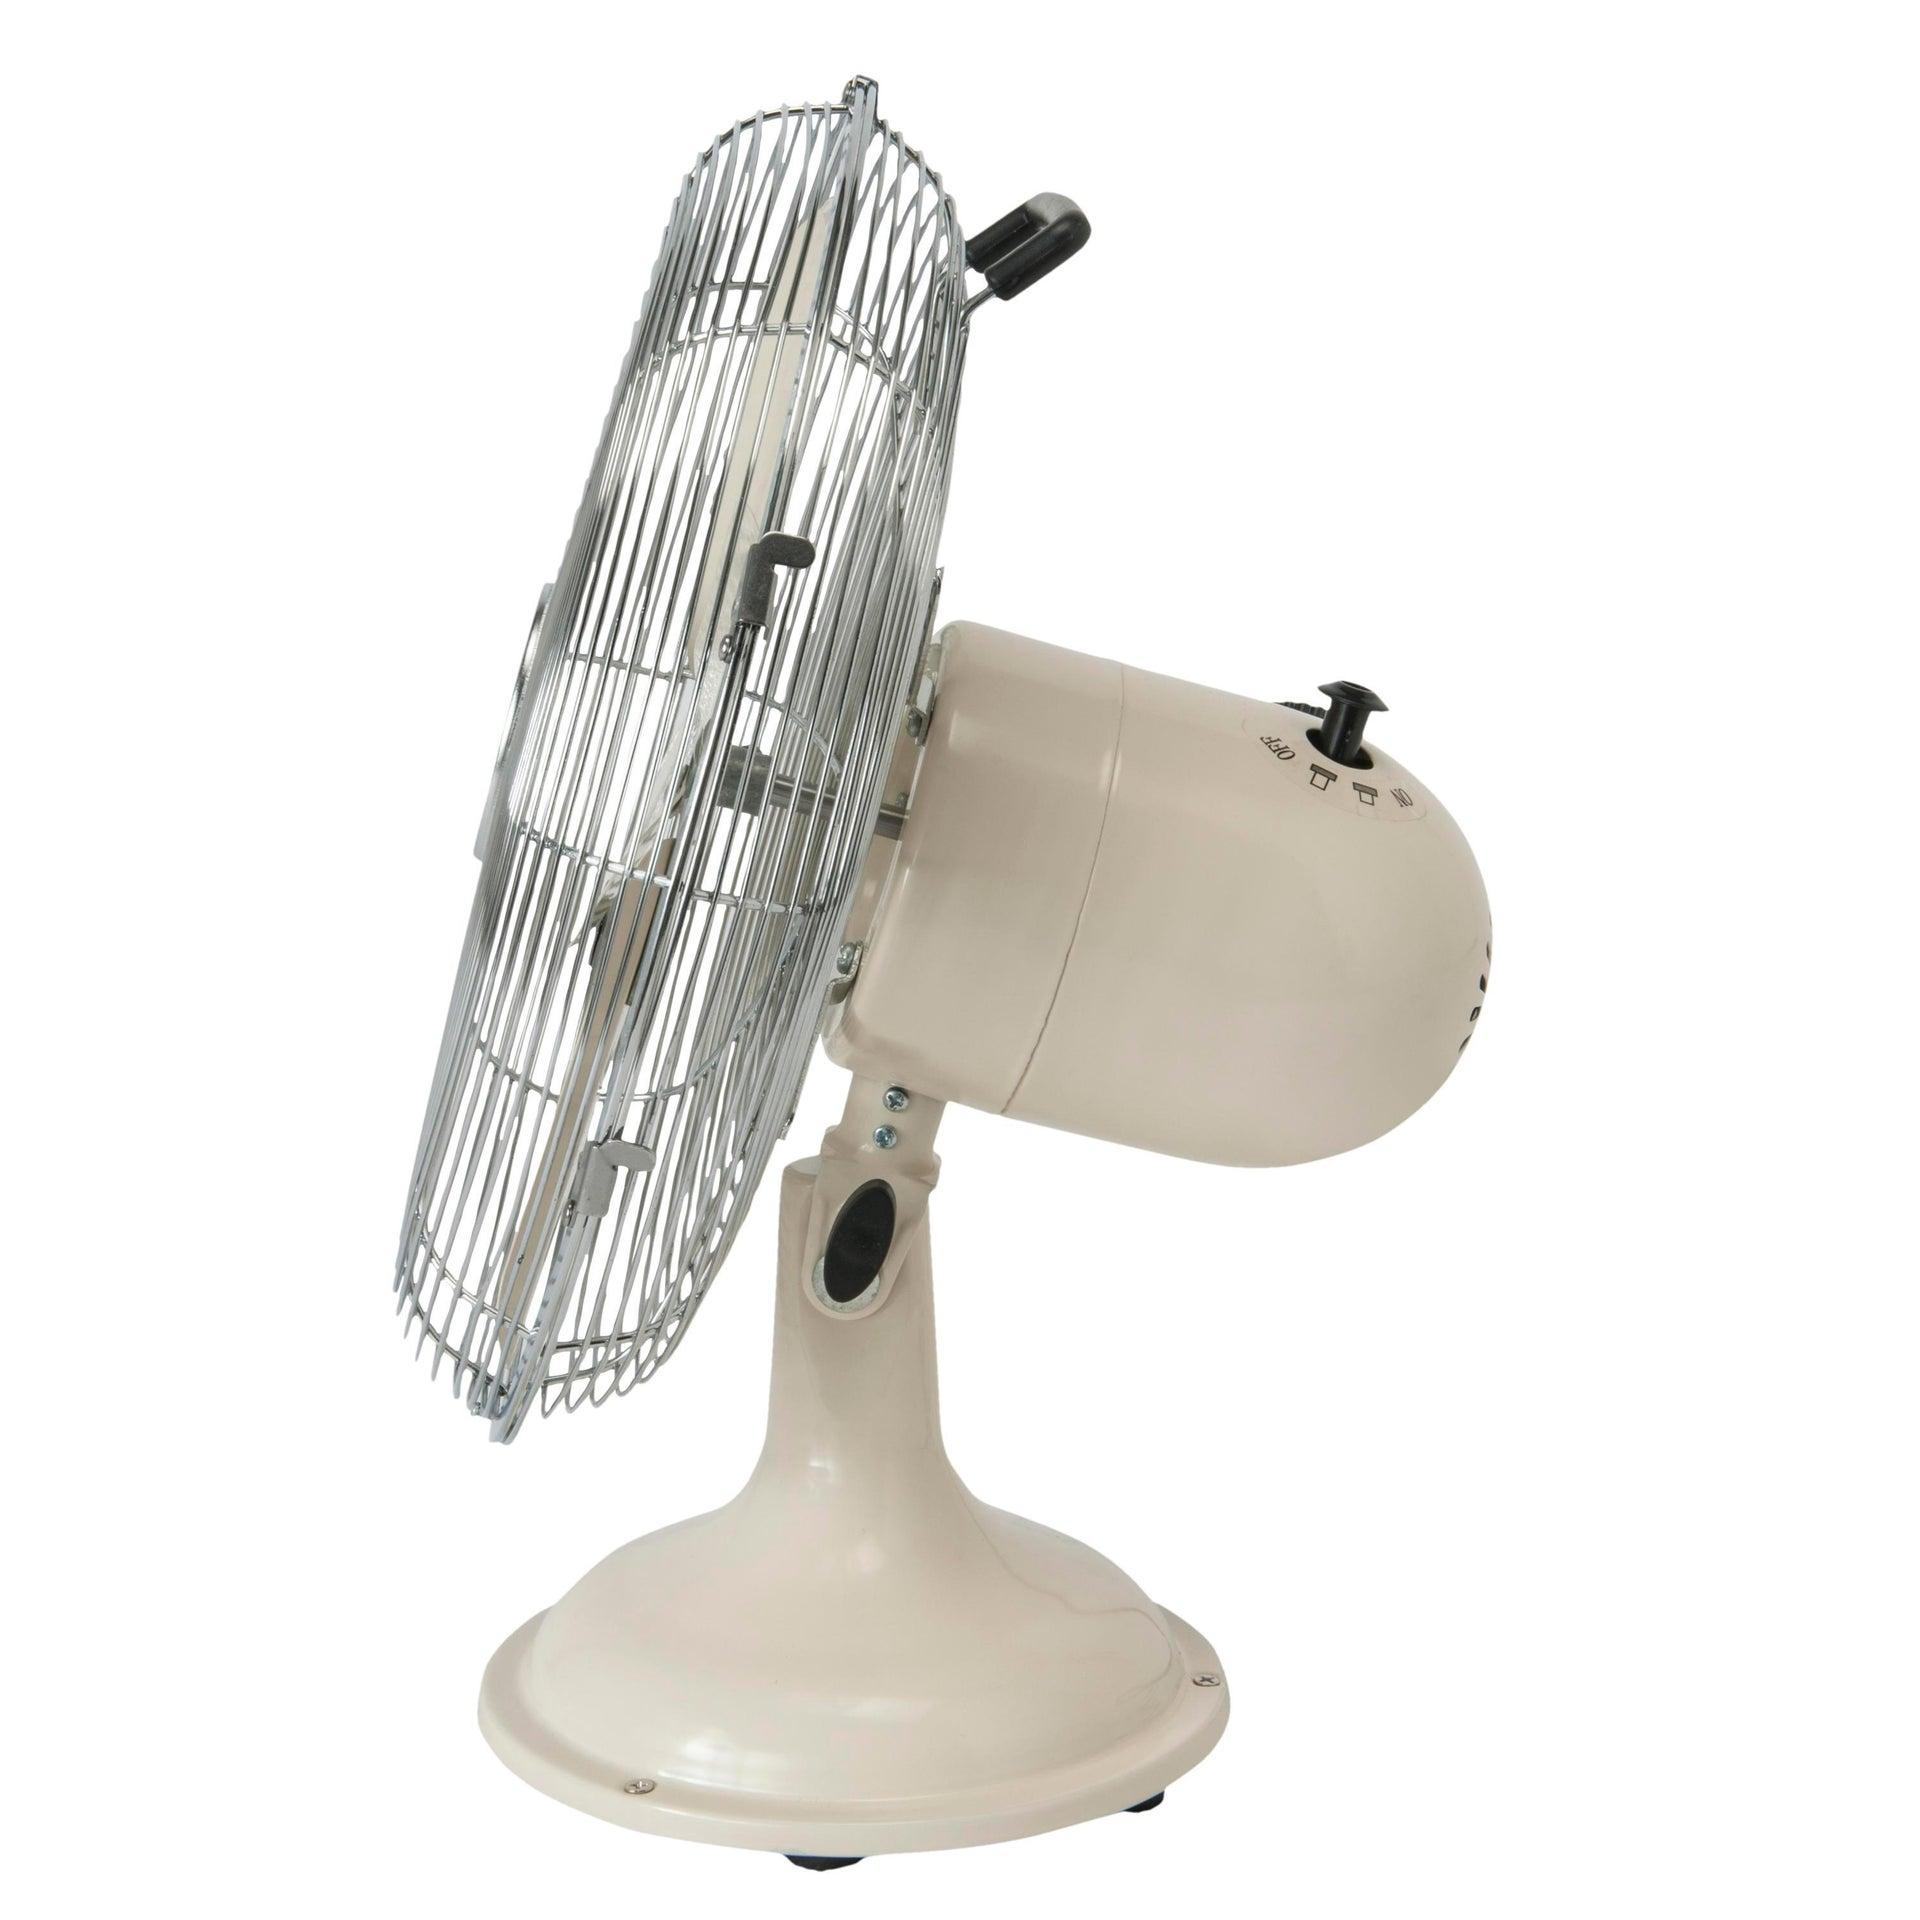 Ventilatore da tavolo EQUATION bianco 40 W Ø 30 cm - 2